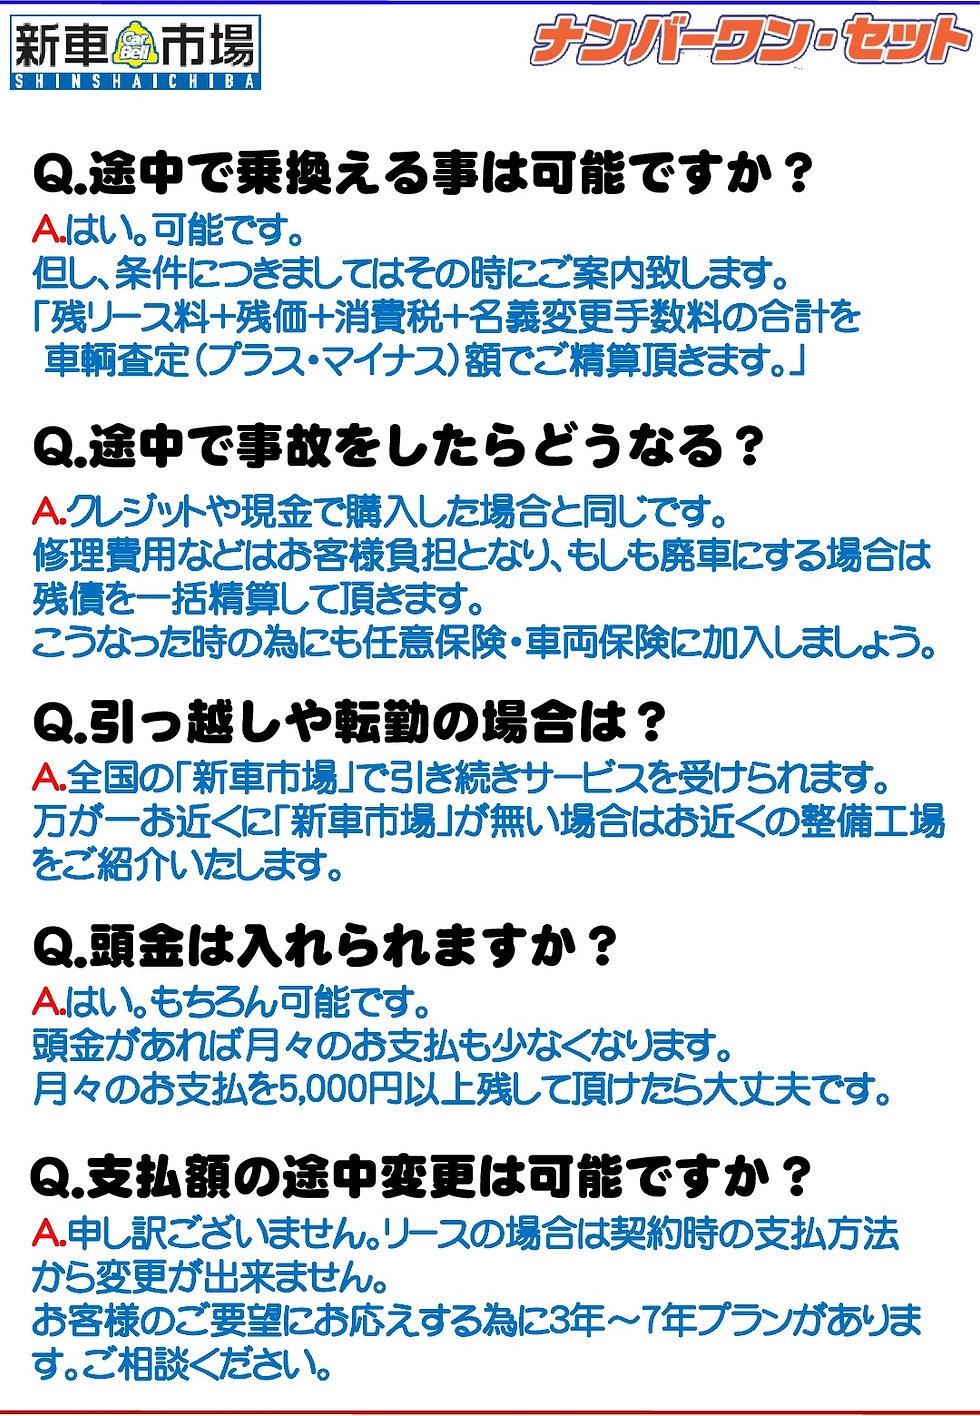 ilovepdf_com-16.jpg